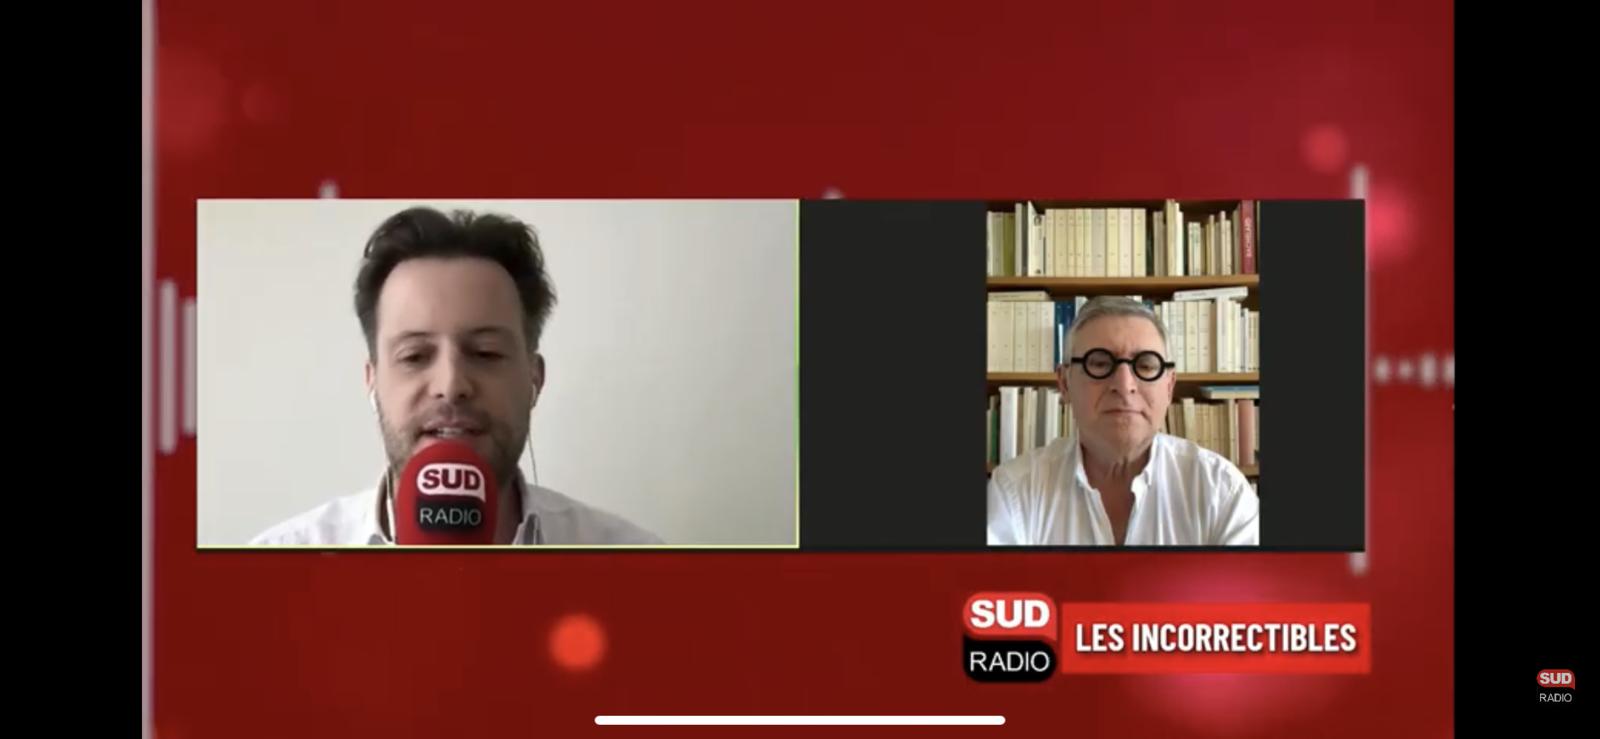 Michel Onfray - Les Incorrectibles (Sud Radio) - 17.05.2020